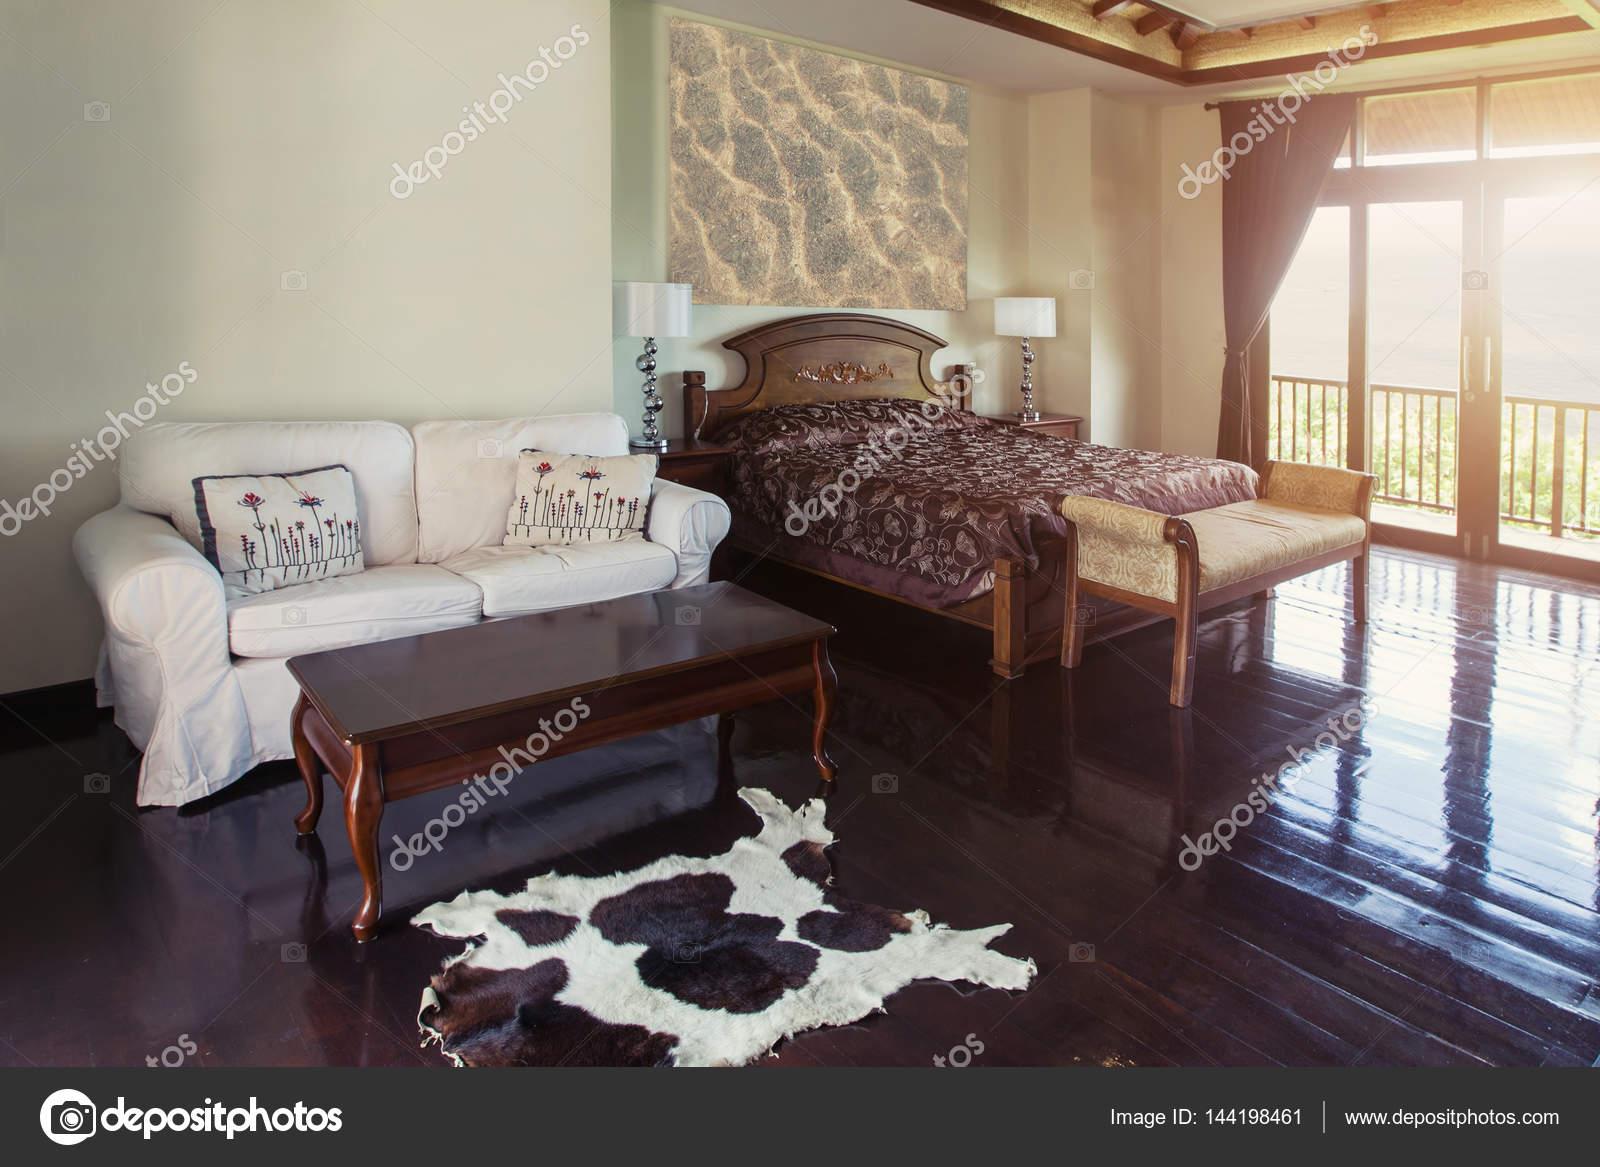 Luxus Villa Schlafzimmer Innenarchitektur — Stockfoto © AnnaTamila ...